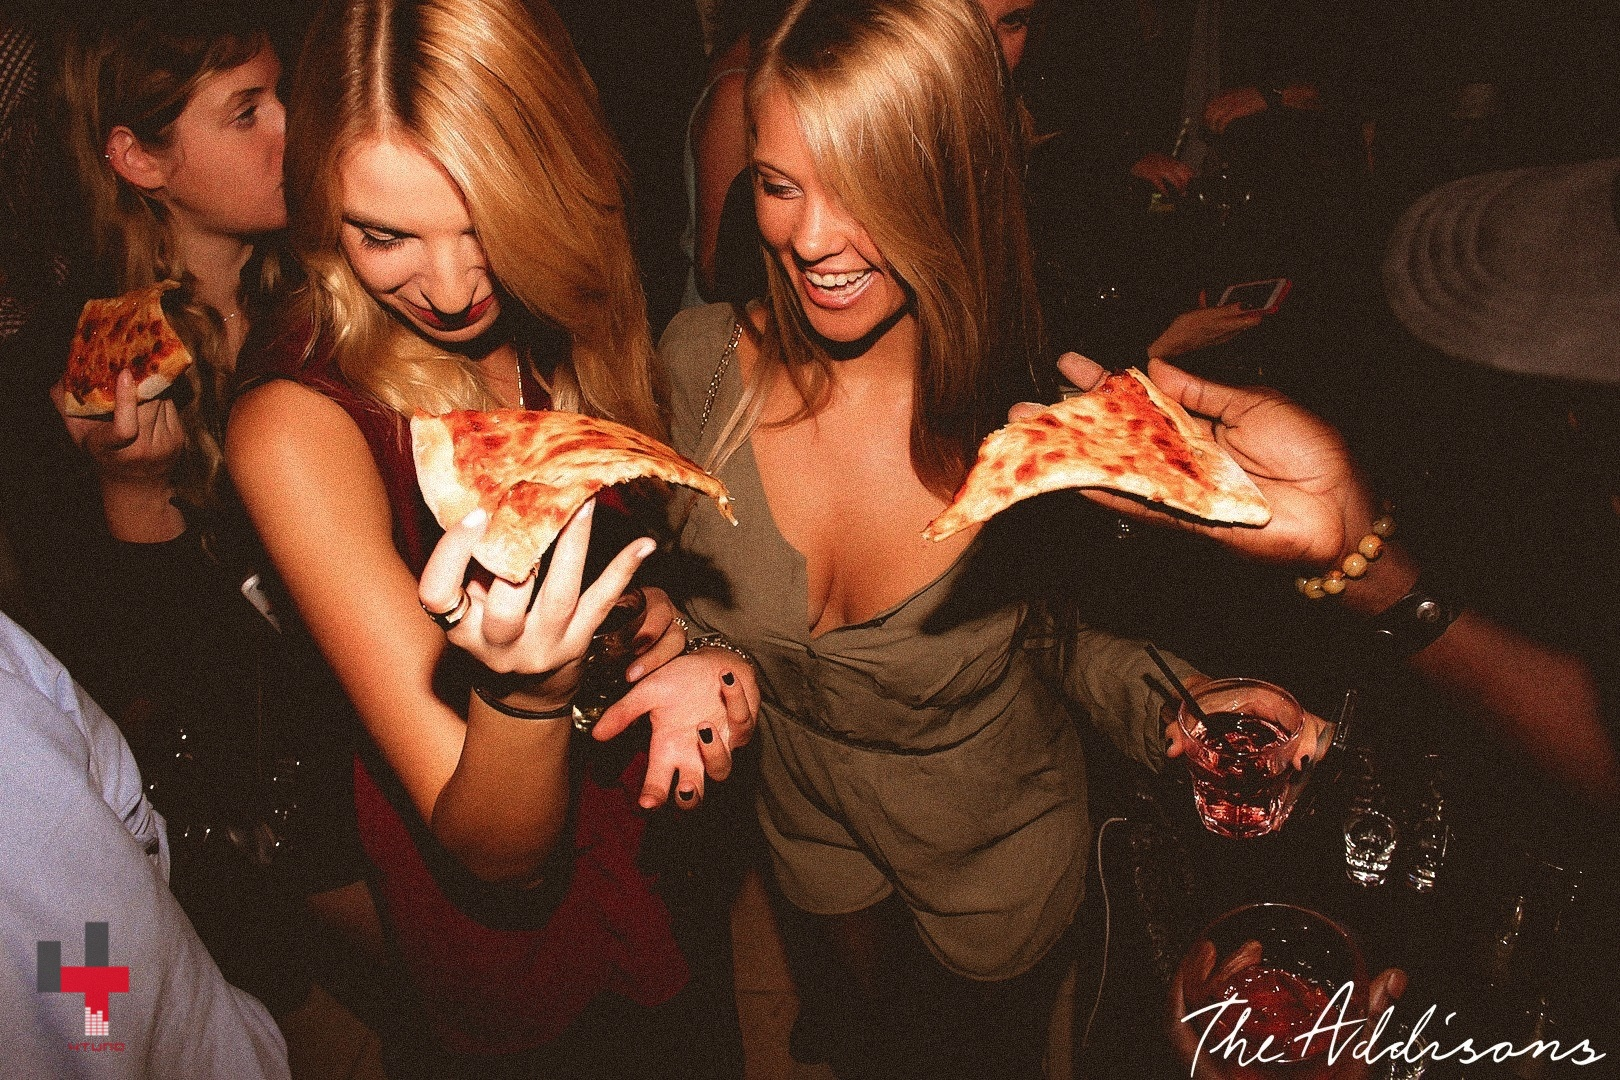 the addisons nightclub 4tune nightlife and hospitality toronto_020